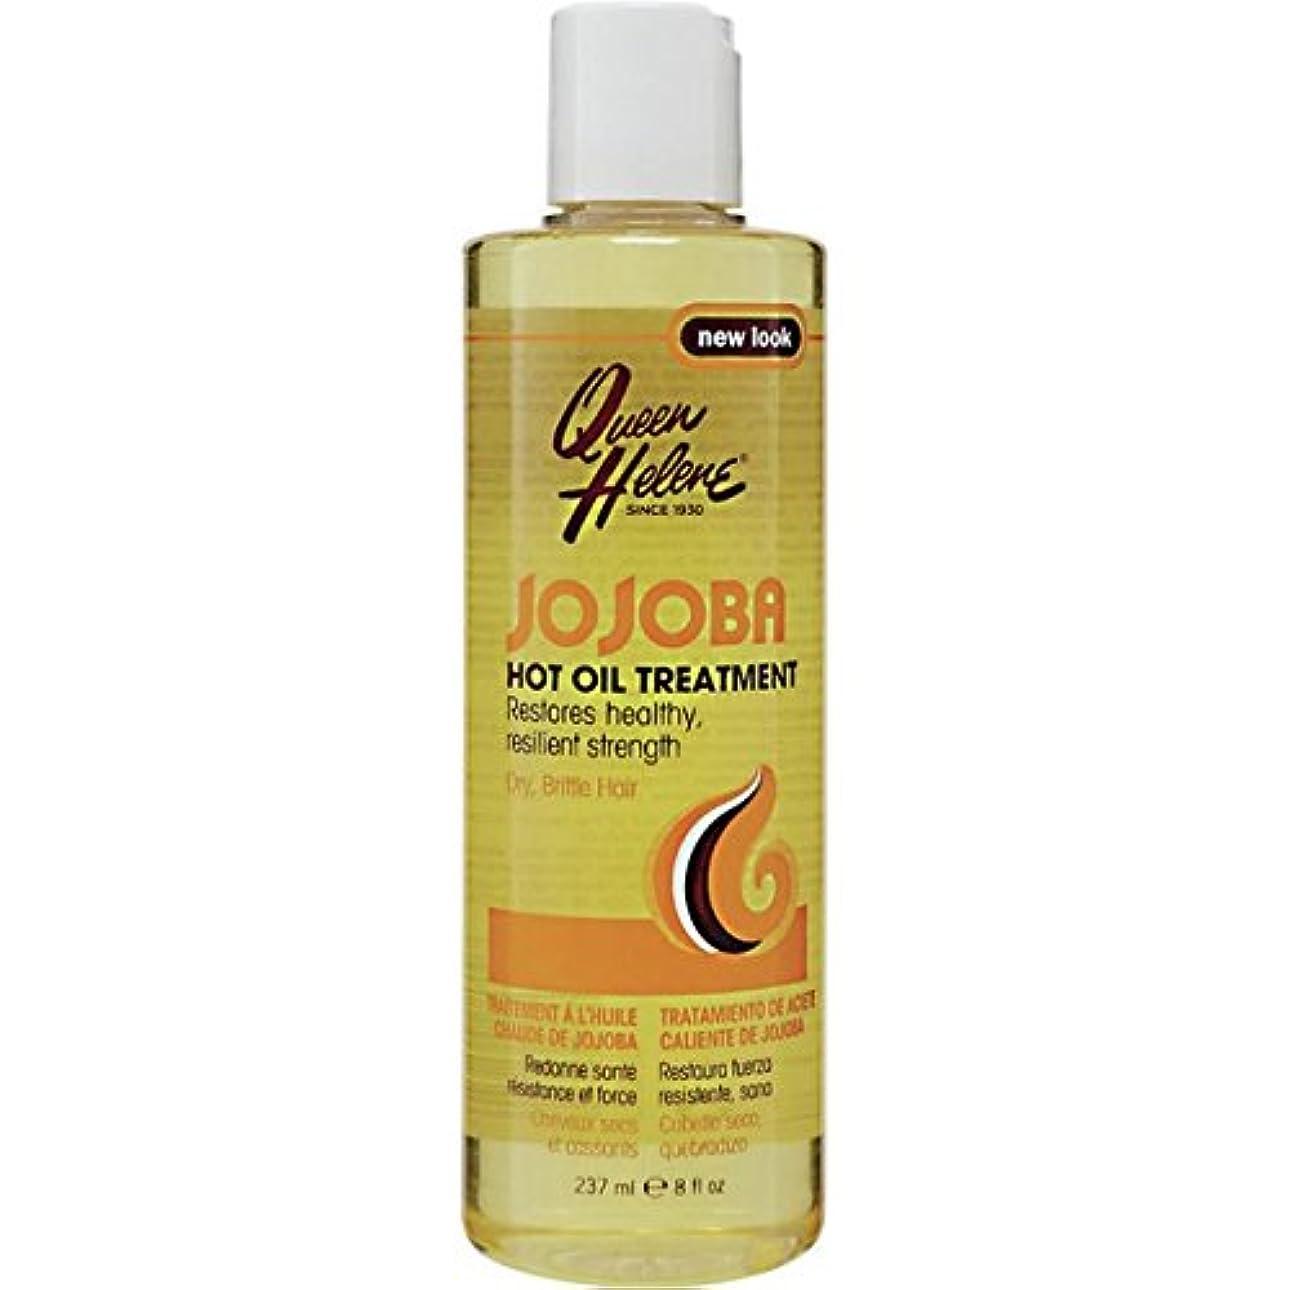 生活投獄招待Queen Helene Jojoba Hot Oil 235 ml Treatment (並行輸入品)